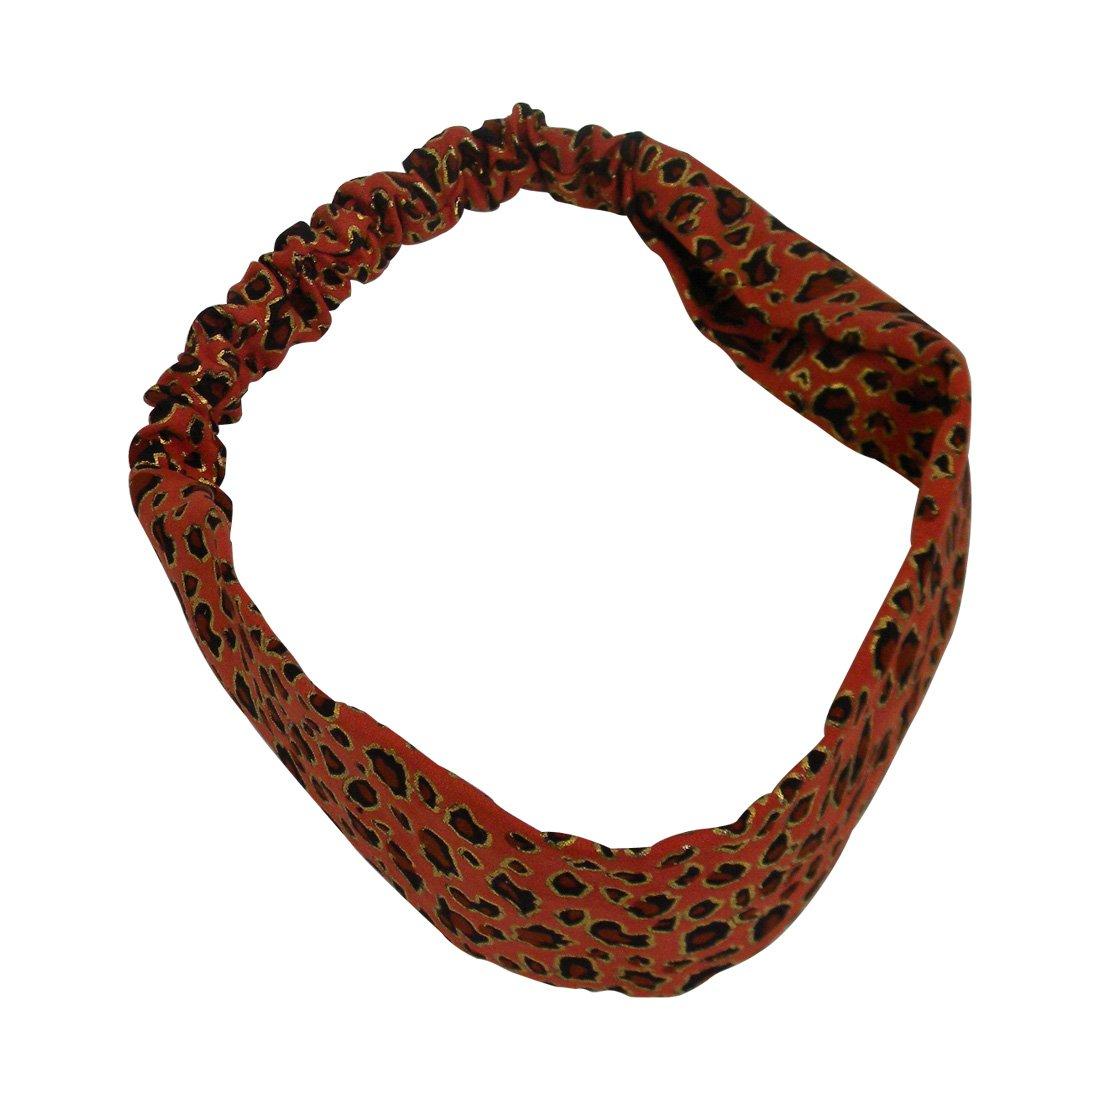 Amazon.com   Mustard Headwrap with Gold Leopard Spots Soft Headband for  women with Elastic   Beauty 9e530e6cd4e